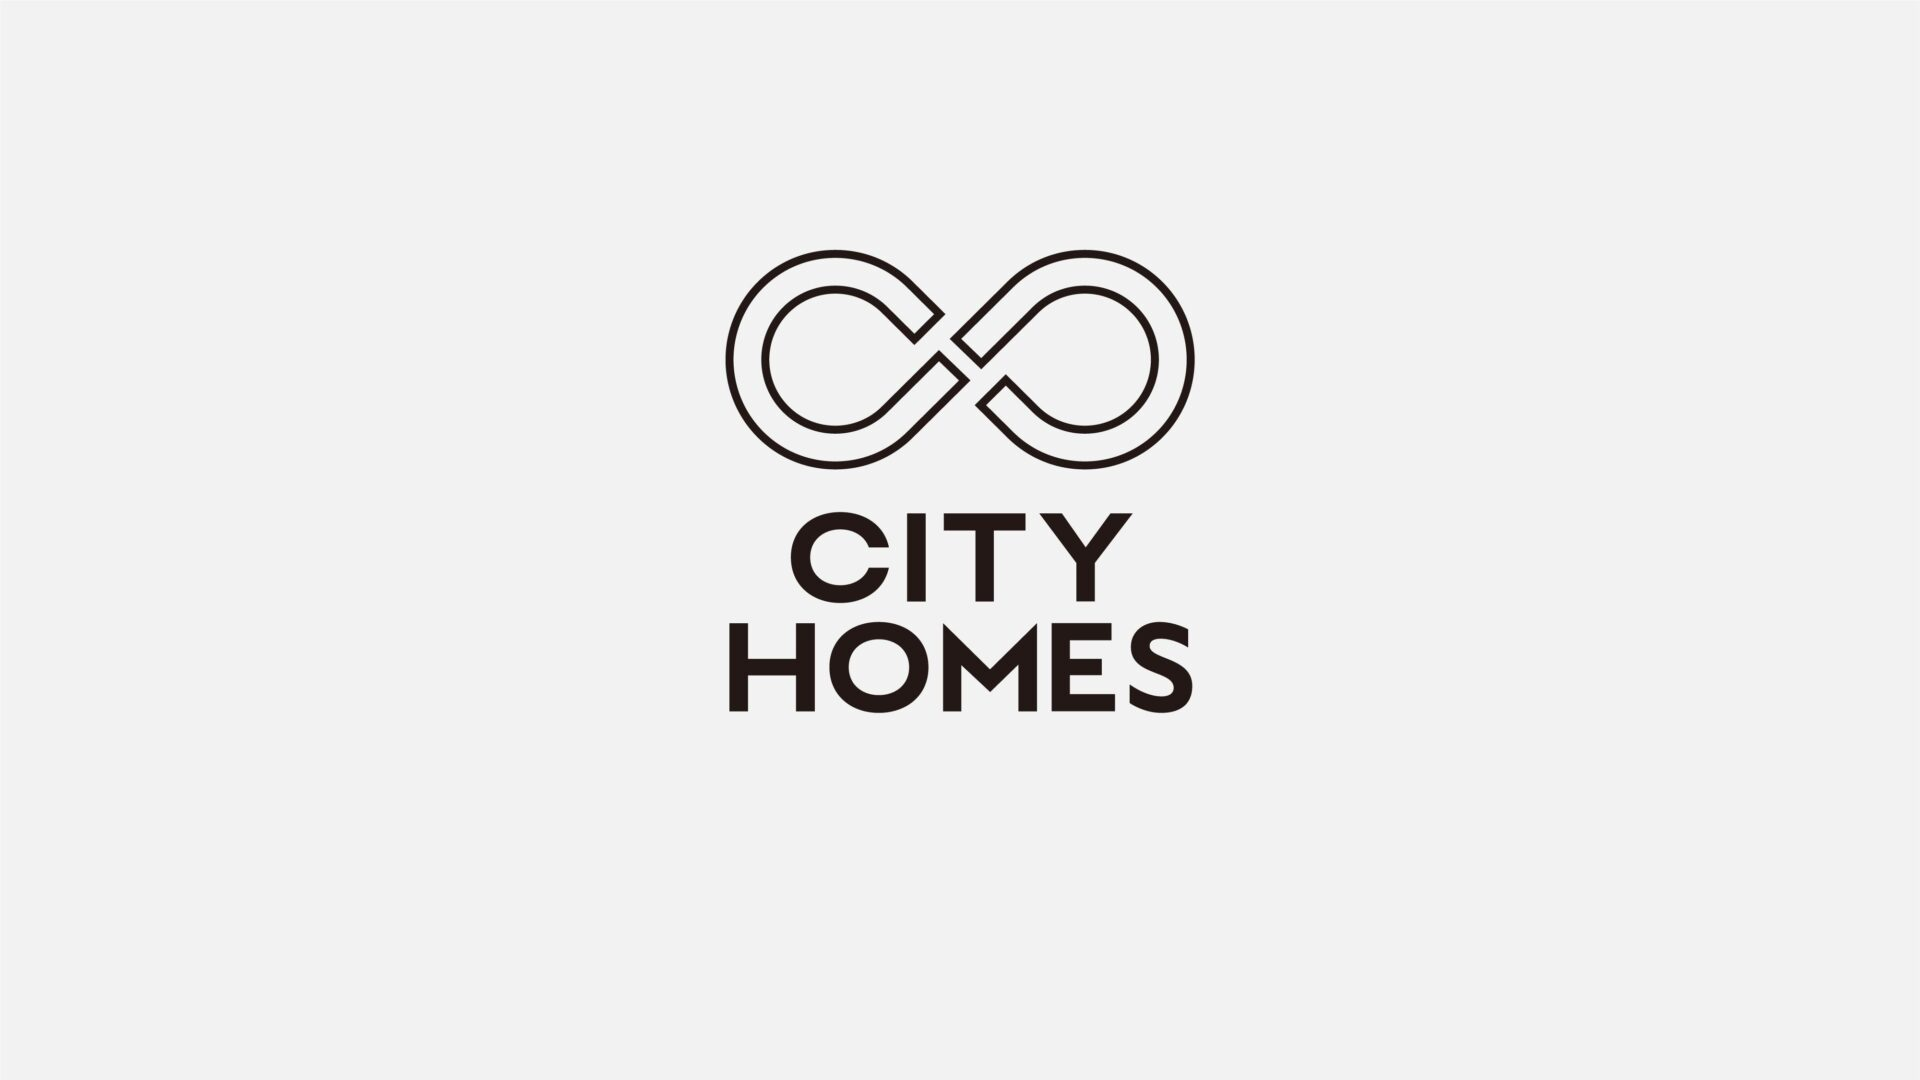 「CITYHOMES」のサムネイル画像